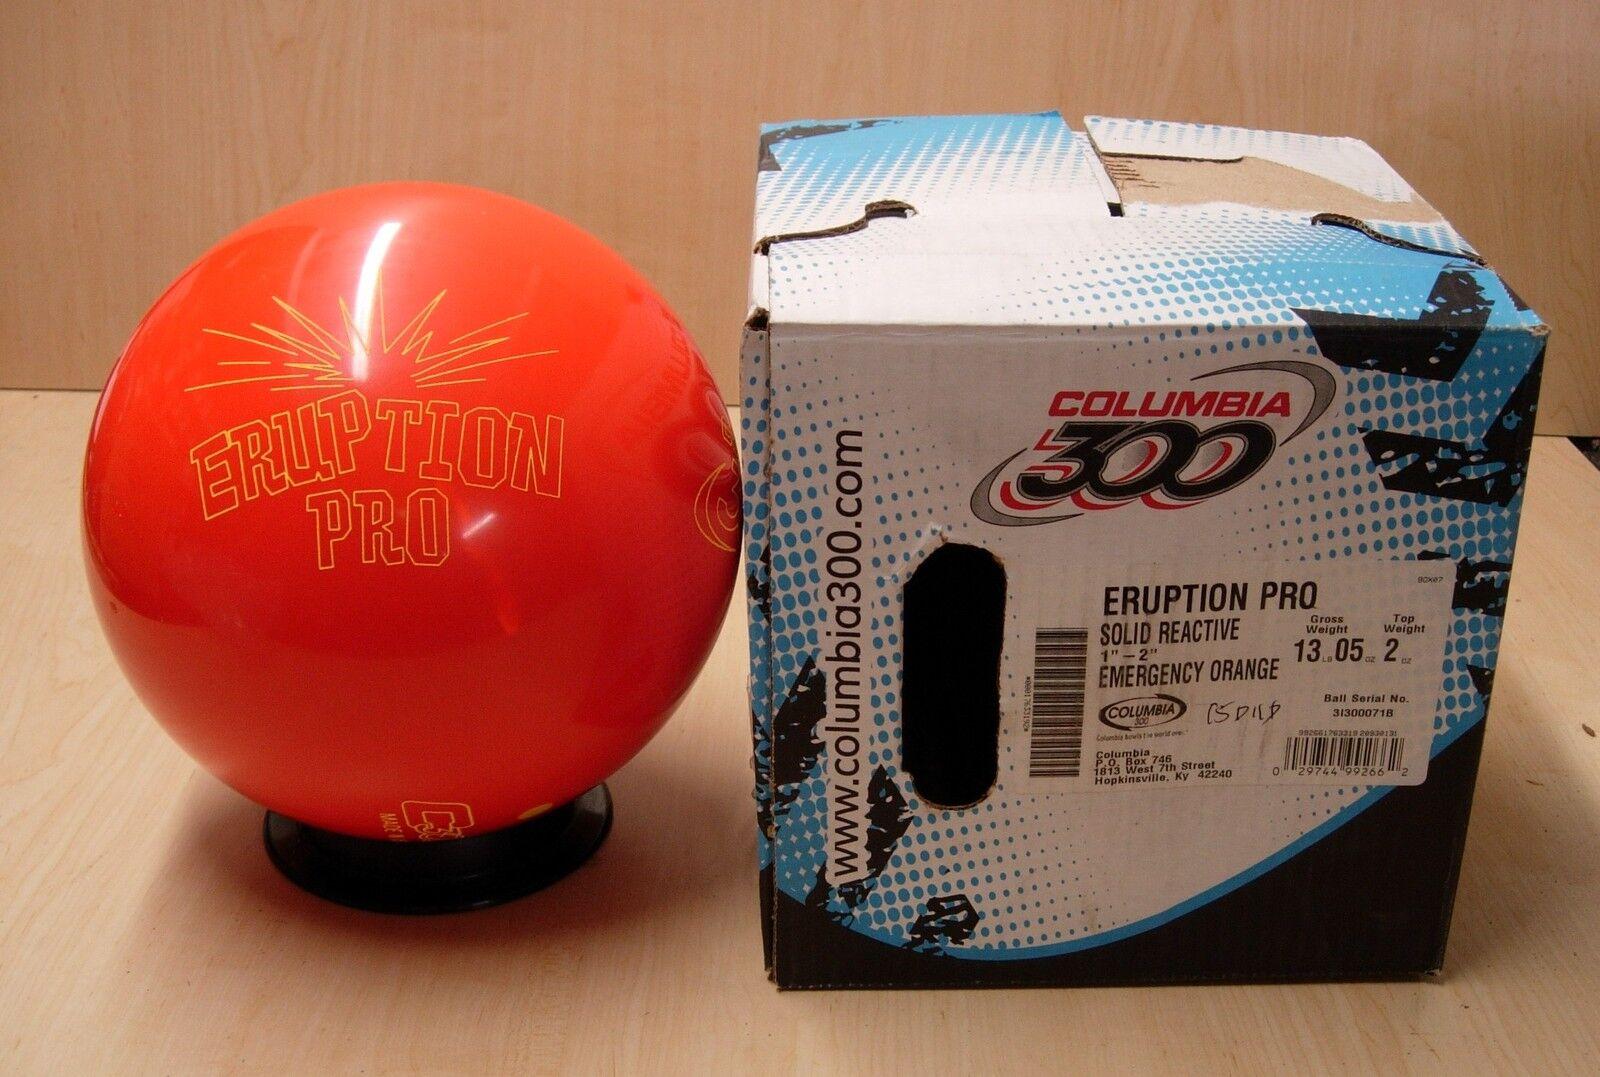 13oz, TW 2, Pin 1-2, NIB Columbia ERUPTION PRO Bowling Ball Emergency orange